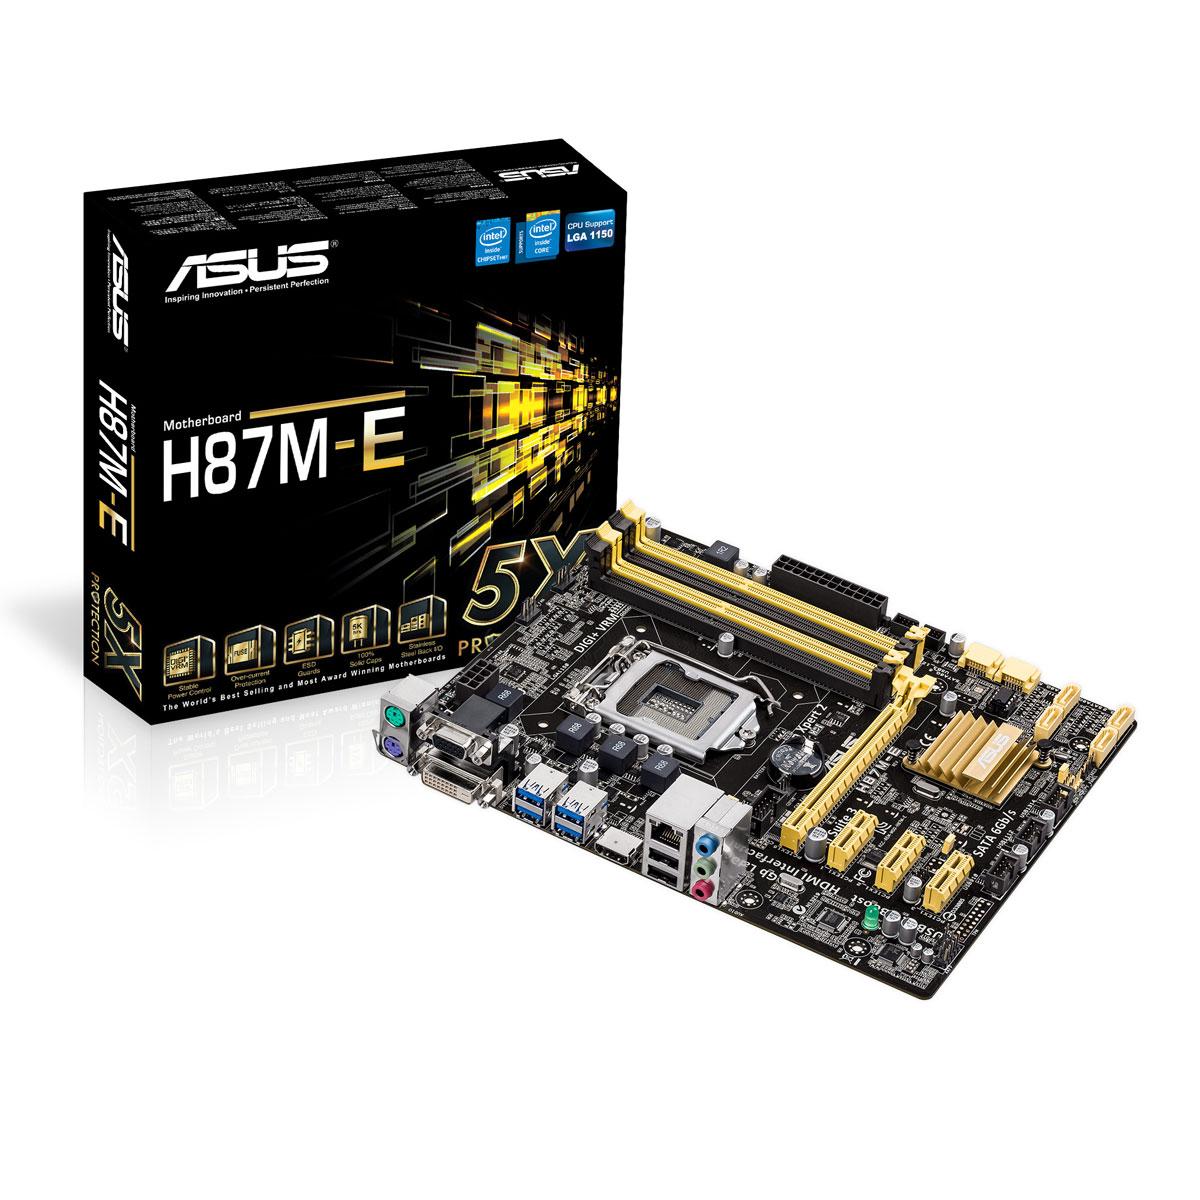 Carte mère ASUS H87M-E C2 Carte mère Micro ATX Socket 1150 Intel H87 Express - SATA 6Gb/s - USB 3.0 - 1x PCI-Express 3.0 16x